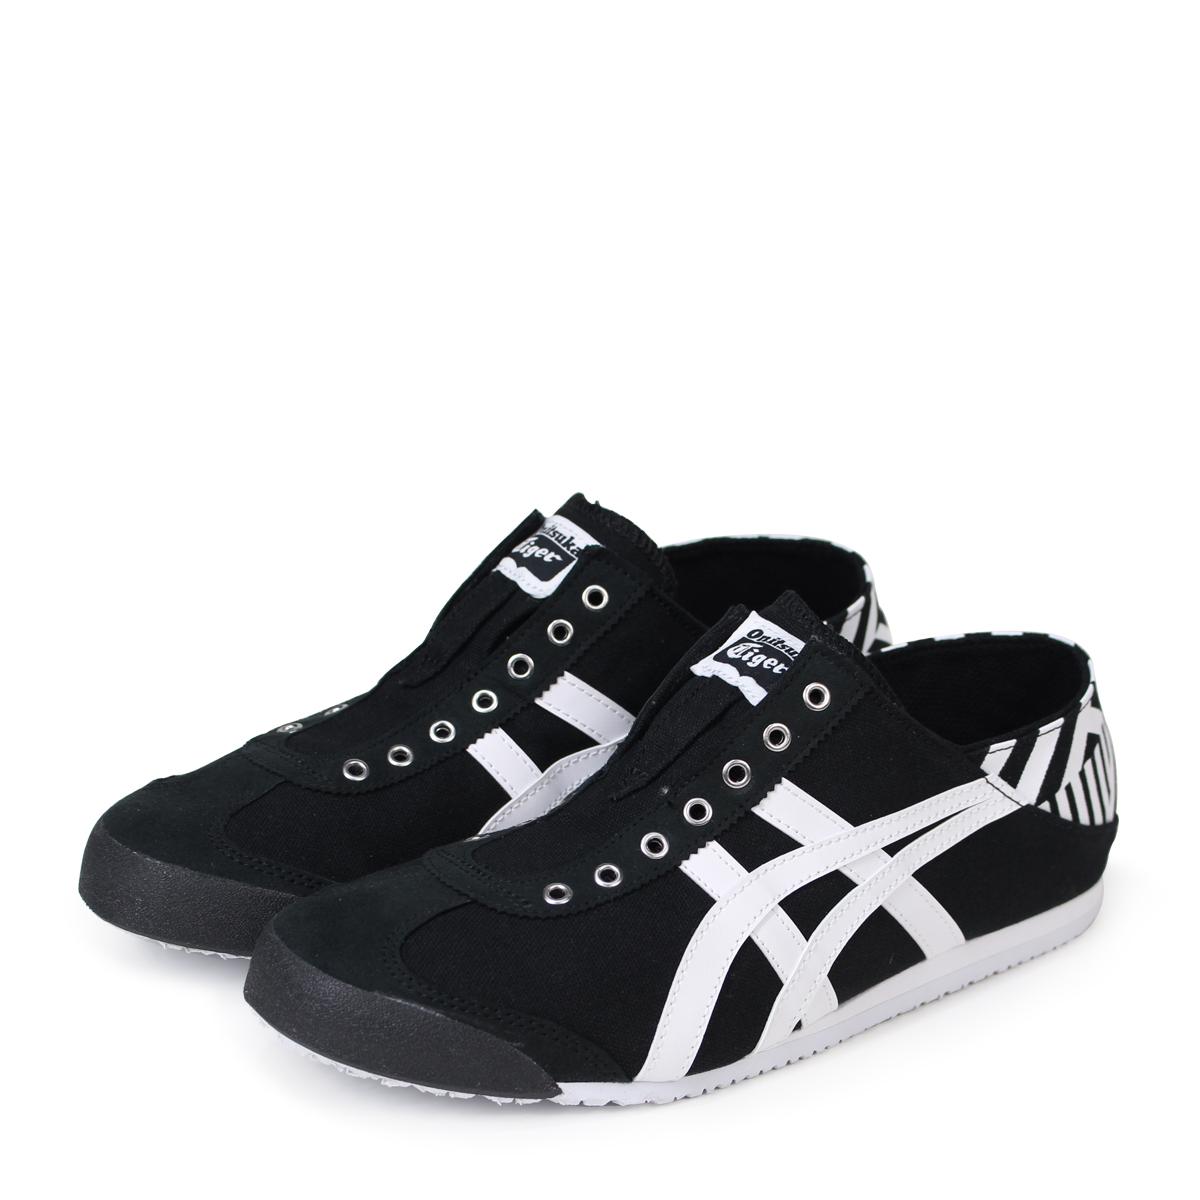 onitsuka tiger mexico 66 slip on black and white lan leather